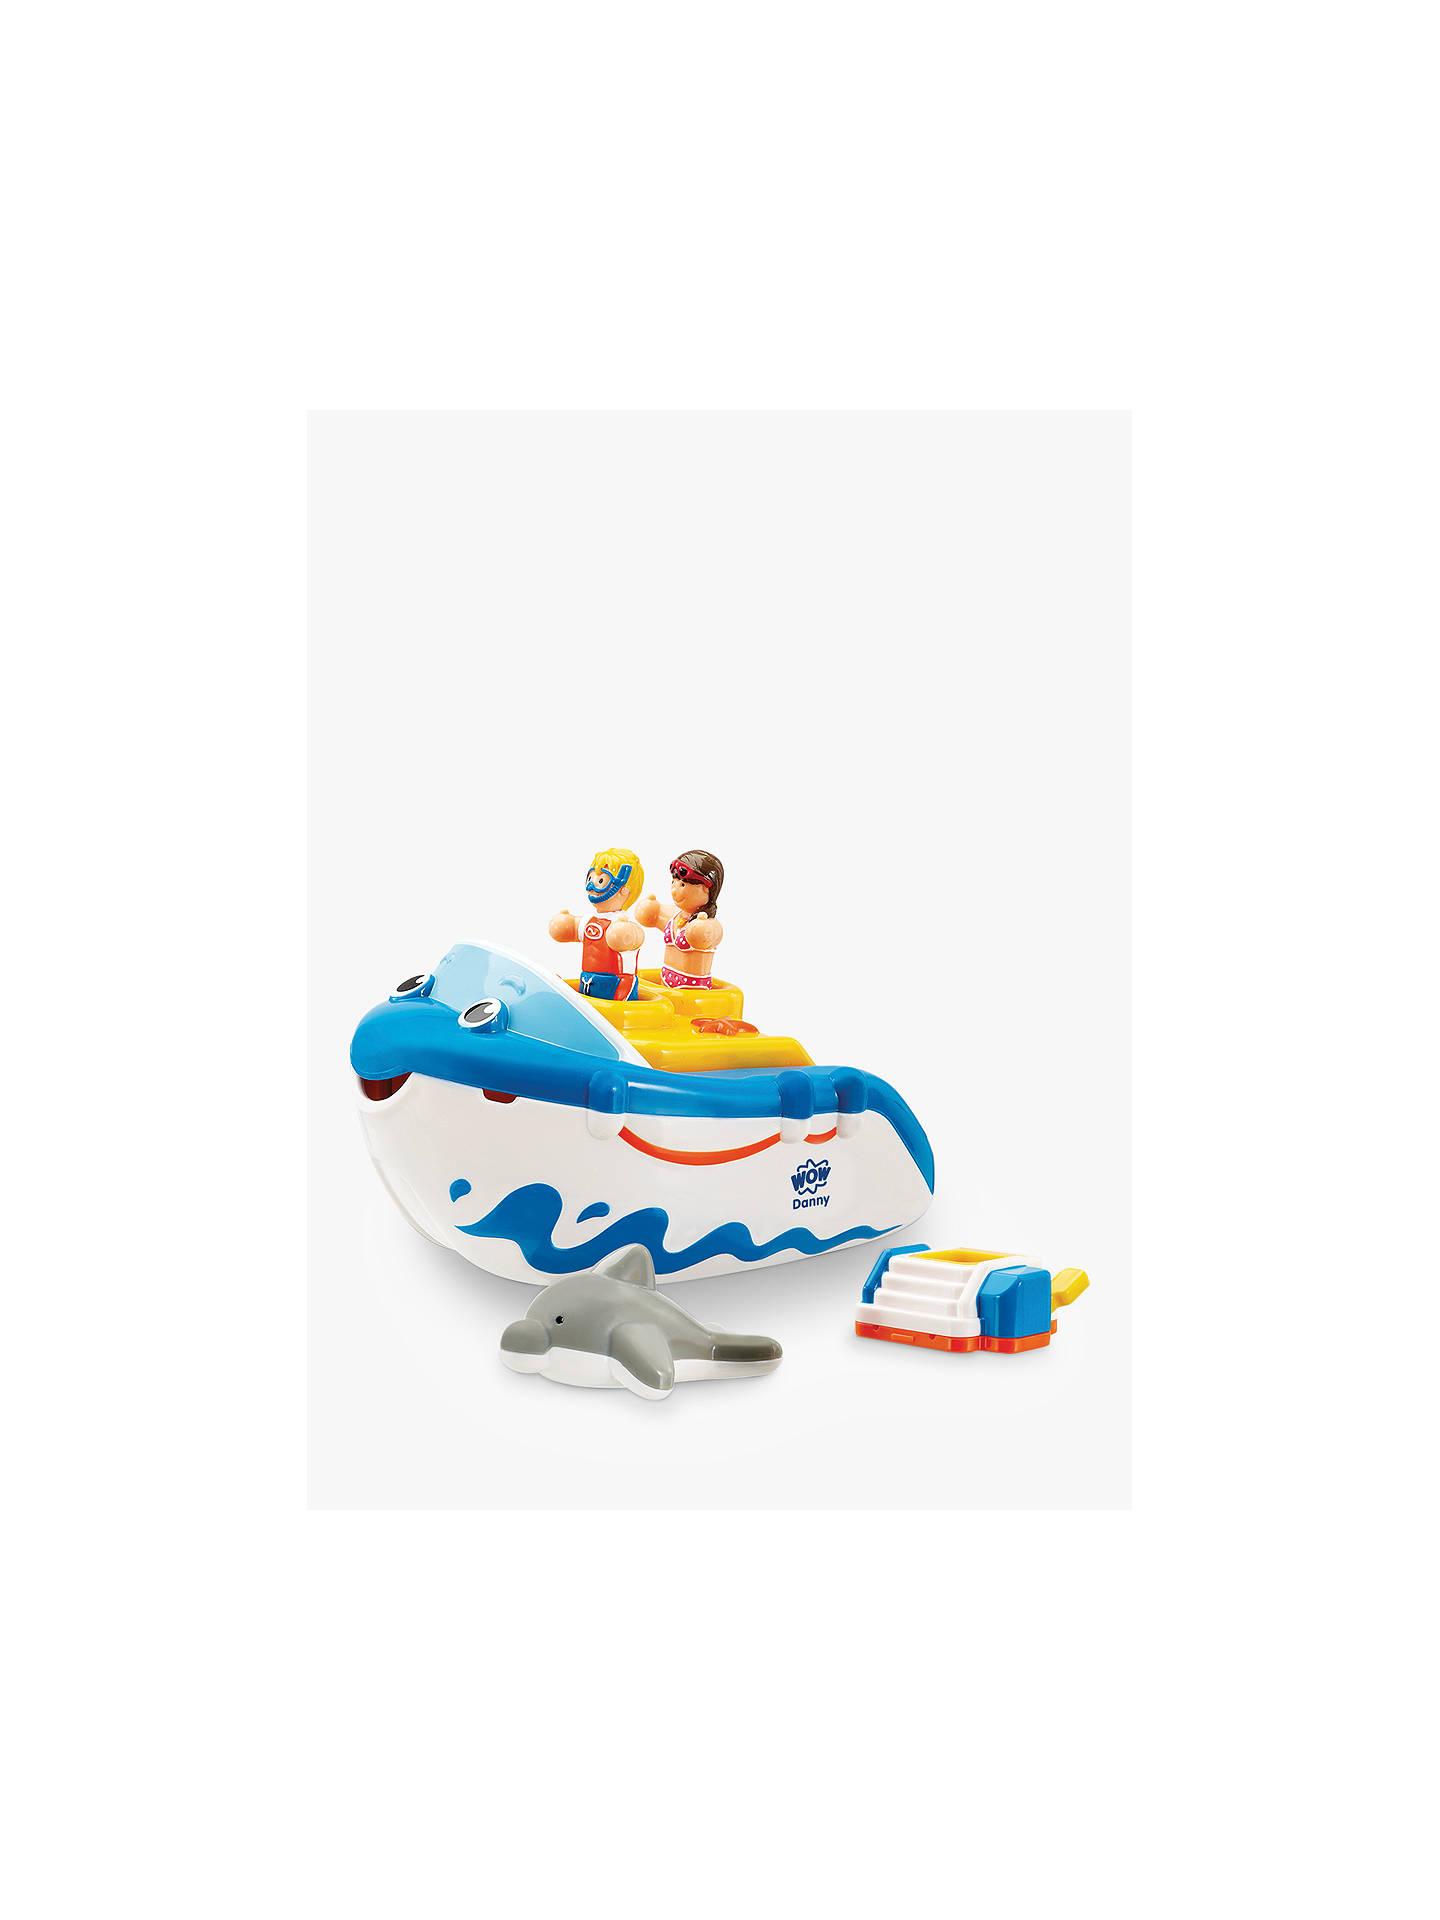 SMALL WORLD TOYS PRESCHOOL Danny The Dolphin Childrens Bathtub Toy